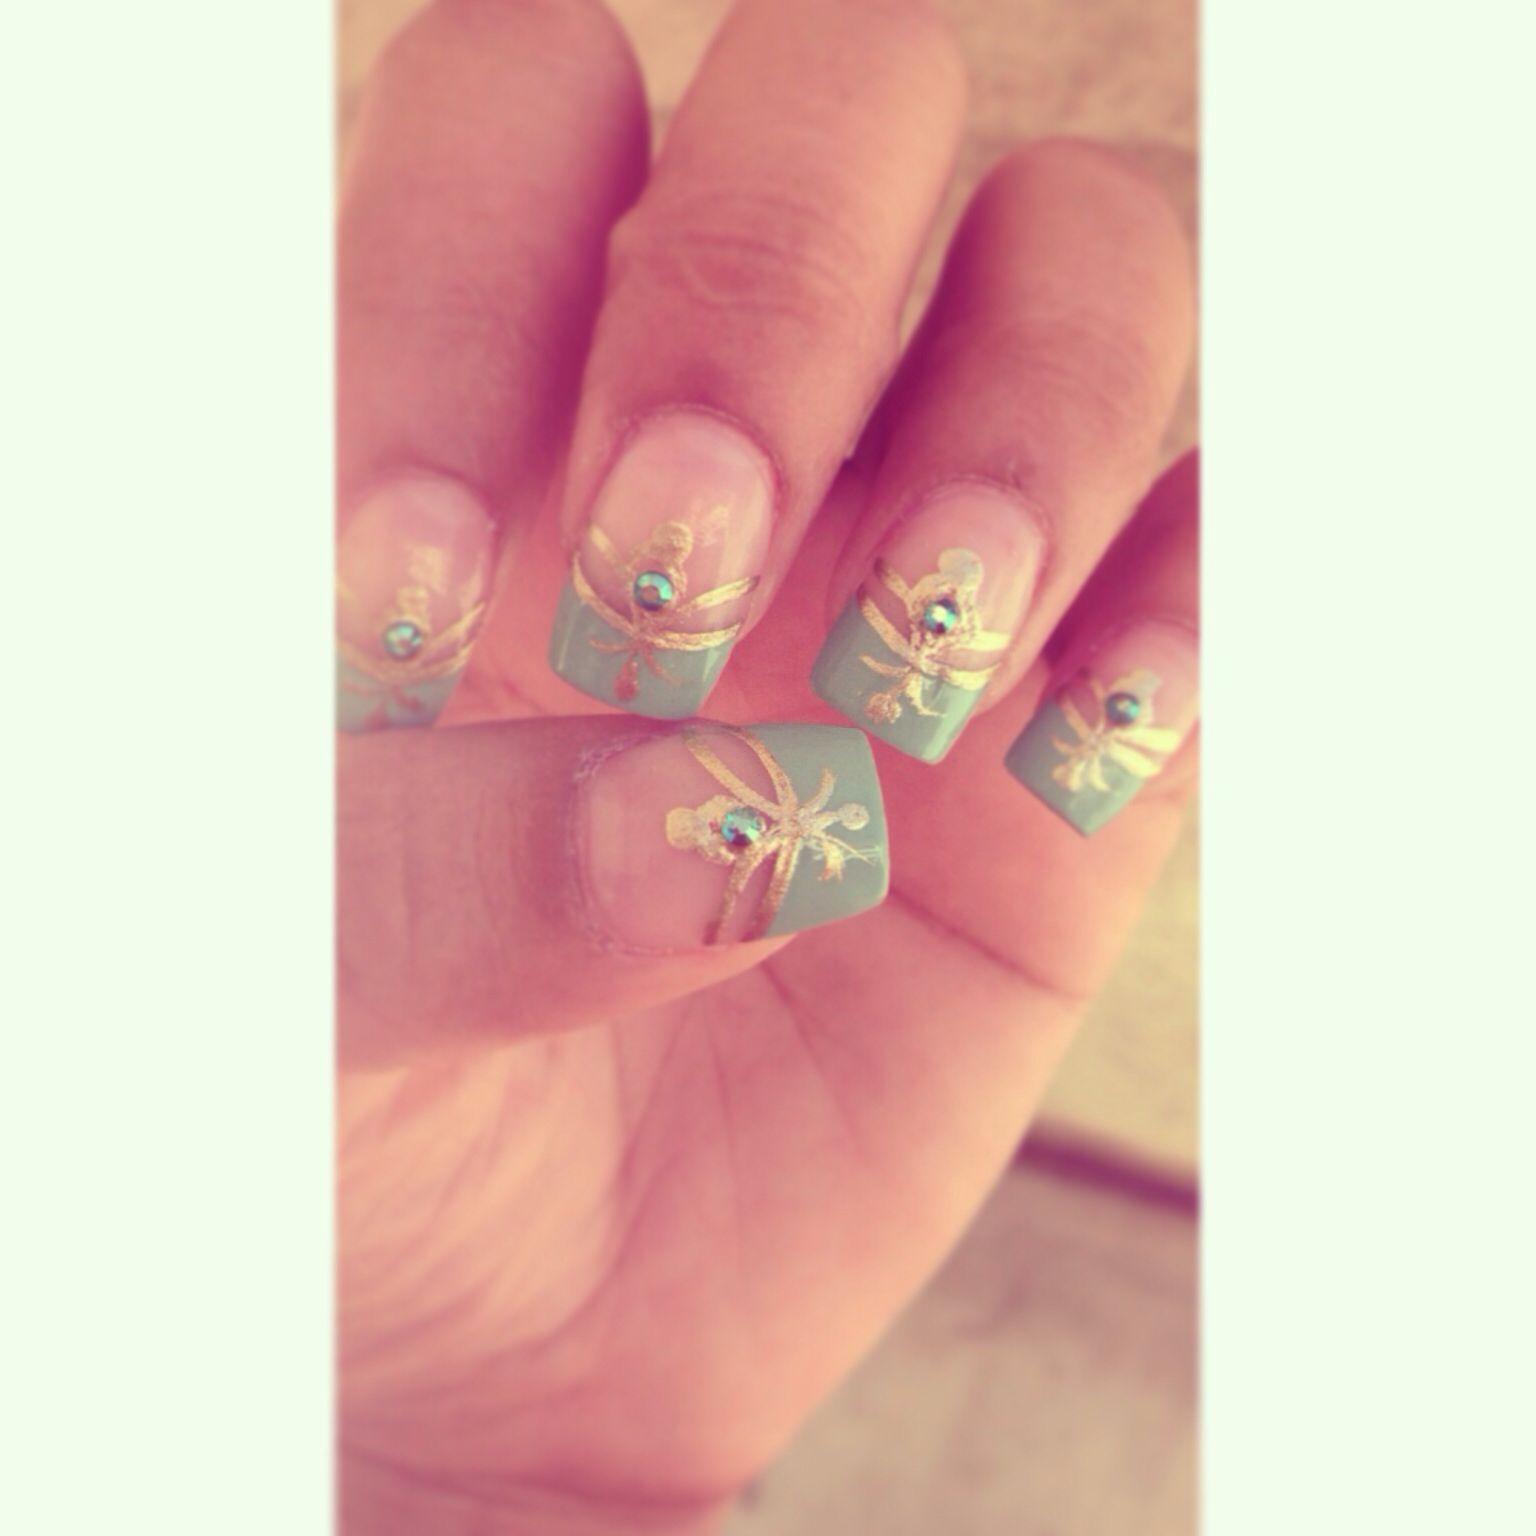 Princess jasmine nails #disney #nails | nails | Pinterest | Disney ...